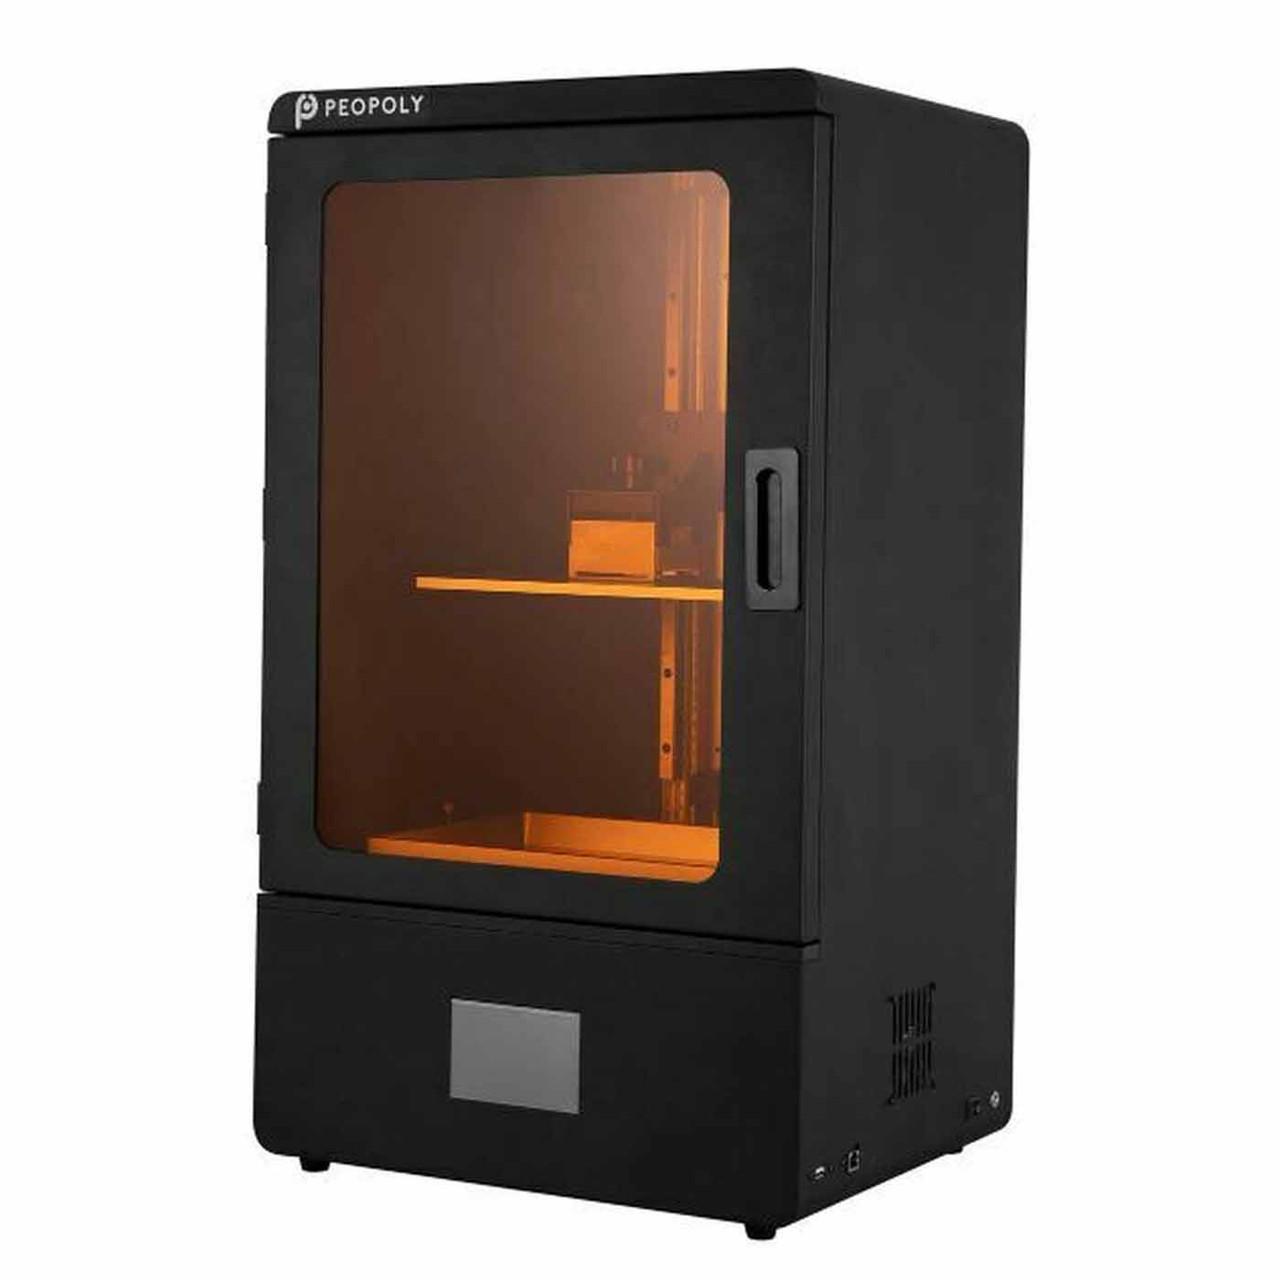 Peopoly Phenom MLSA 3D Printer